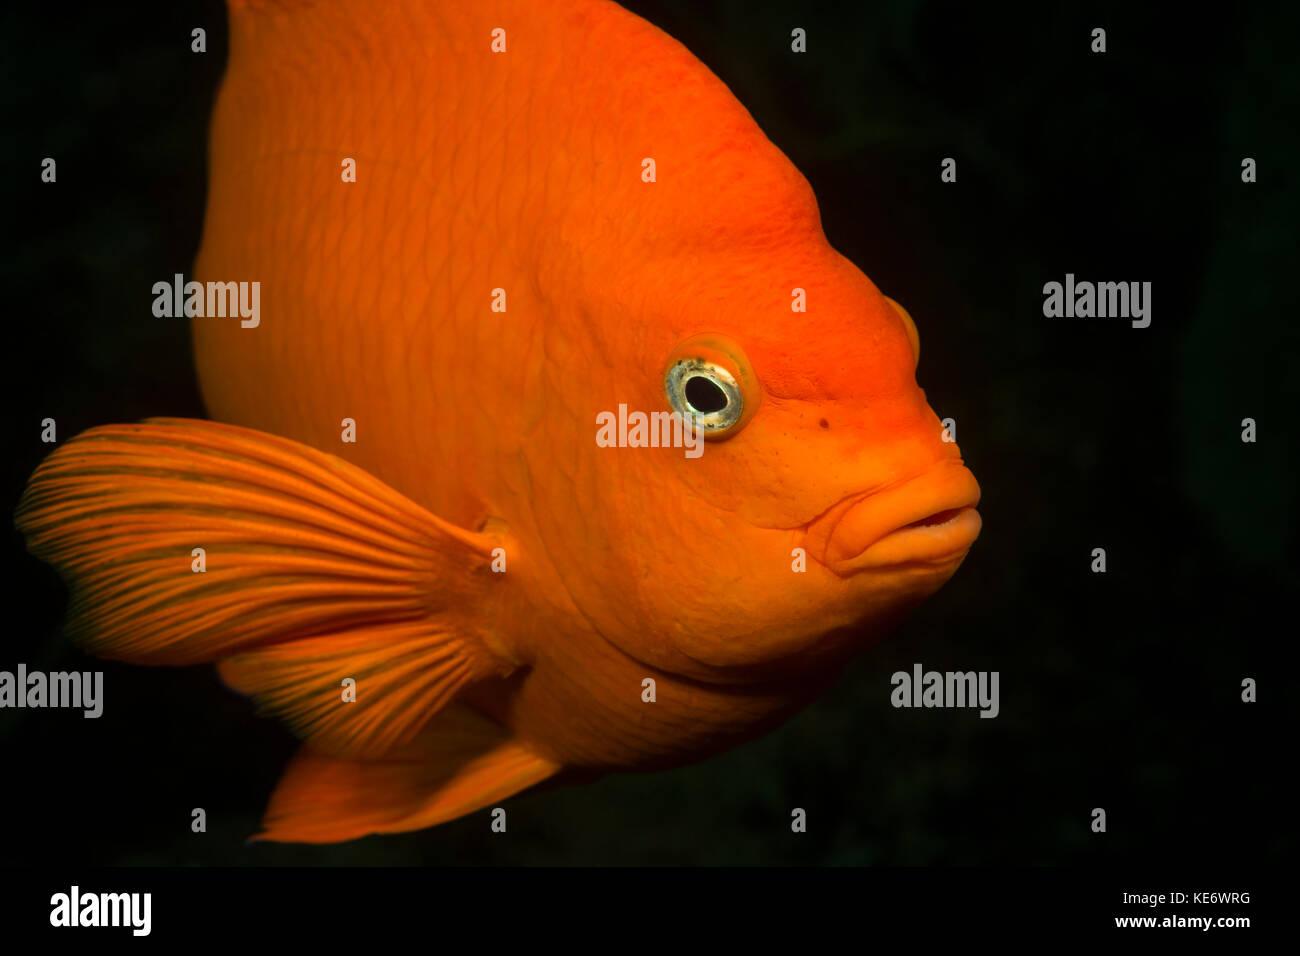 Peces Garibaldi, hypsypops rubicundus, Catalina Island, California, EE.UU. Imagen De Stock